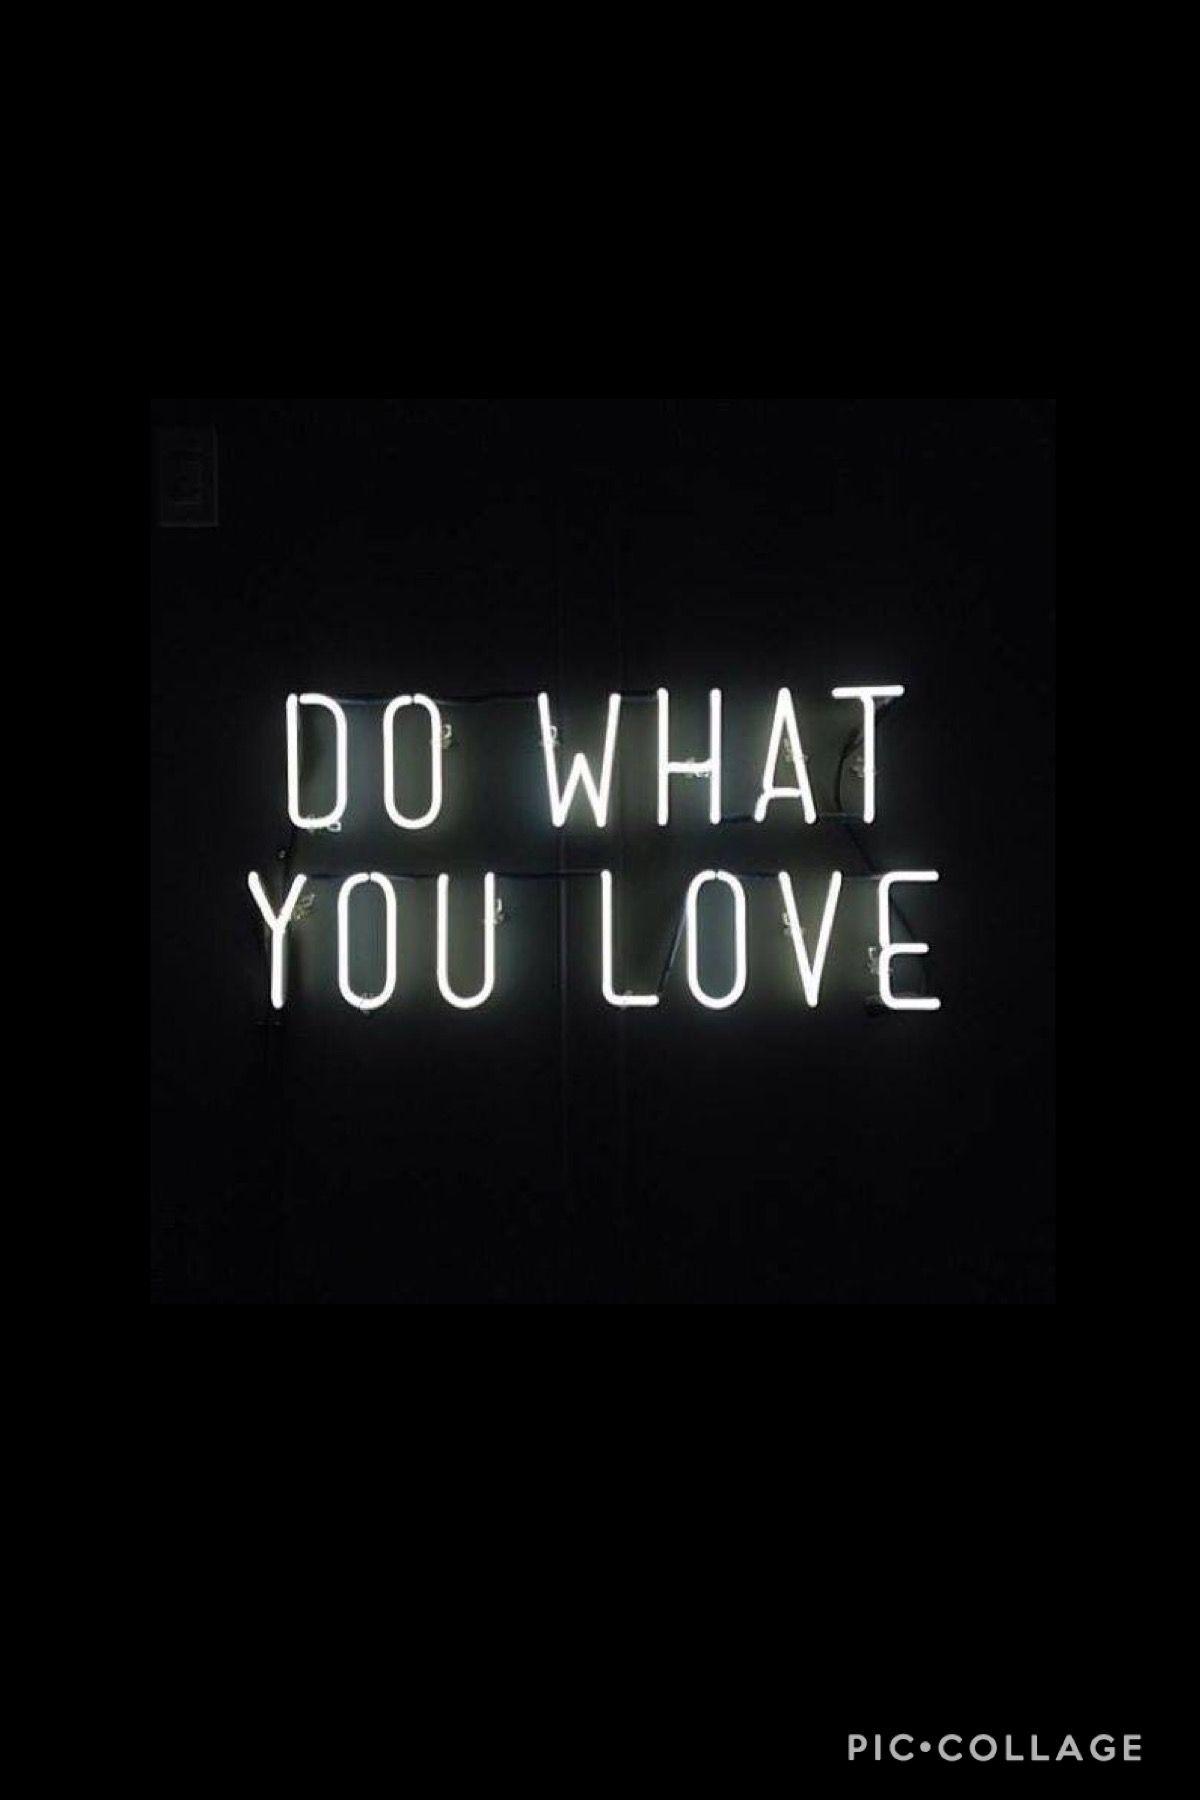 Most Inspiring Wallpaper Love Aesthetic - ab2f42cbb6411ce7afde7f3e0d186501  Graphic_212276.jpg